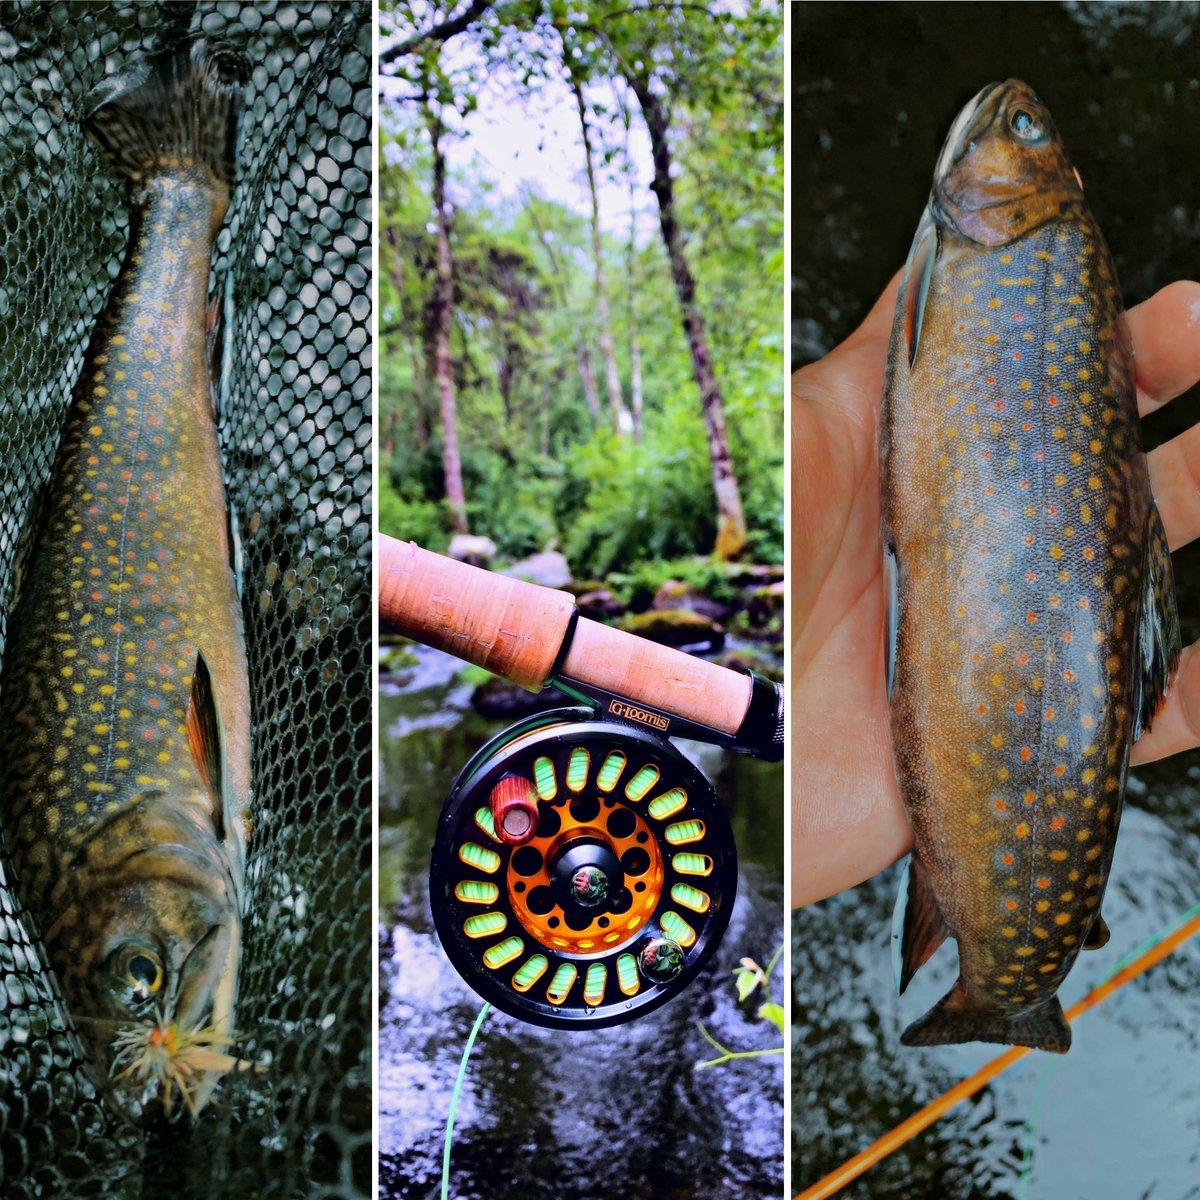 Finally! 2wks! #native #wild #brookie #beast  @scottflyrod @simmsfishing @fishpondusa #keepthemwet @RIOProducts @gerbergear @PatagoniaFlyFsh @MassDFG @OrvisFlyFishingpic.twitter.com/PXAbojYDlx